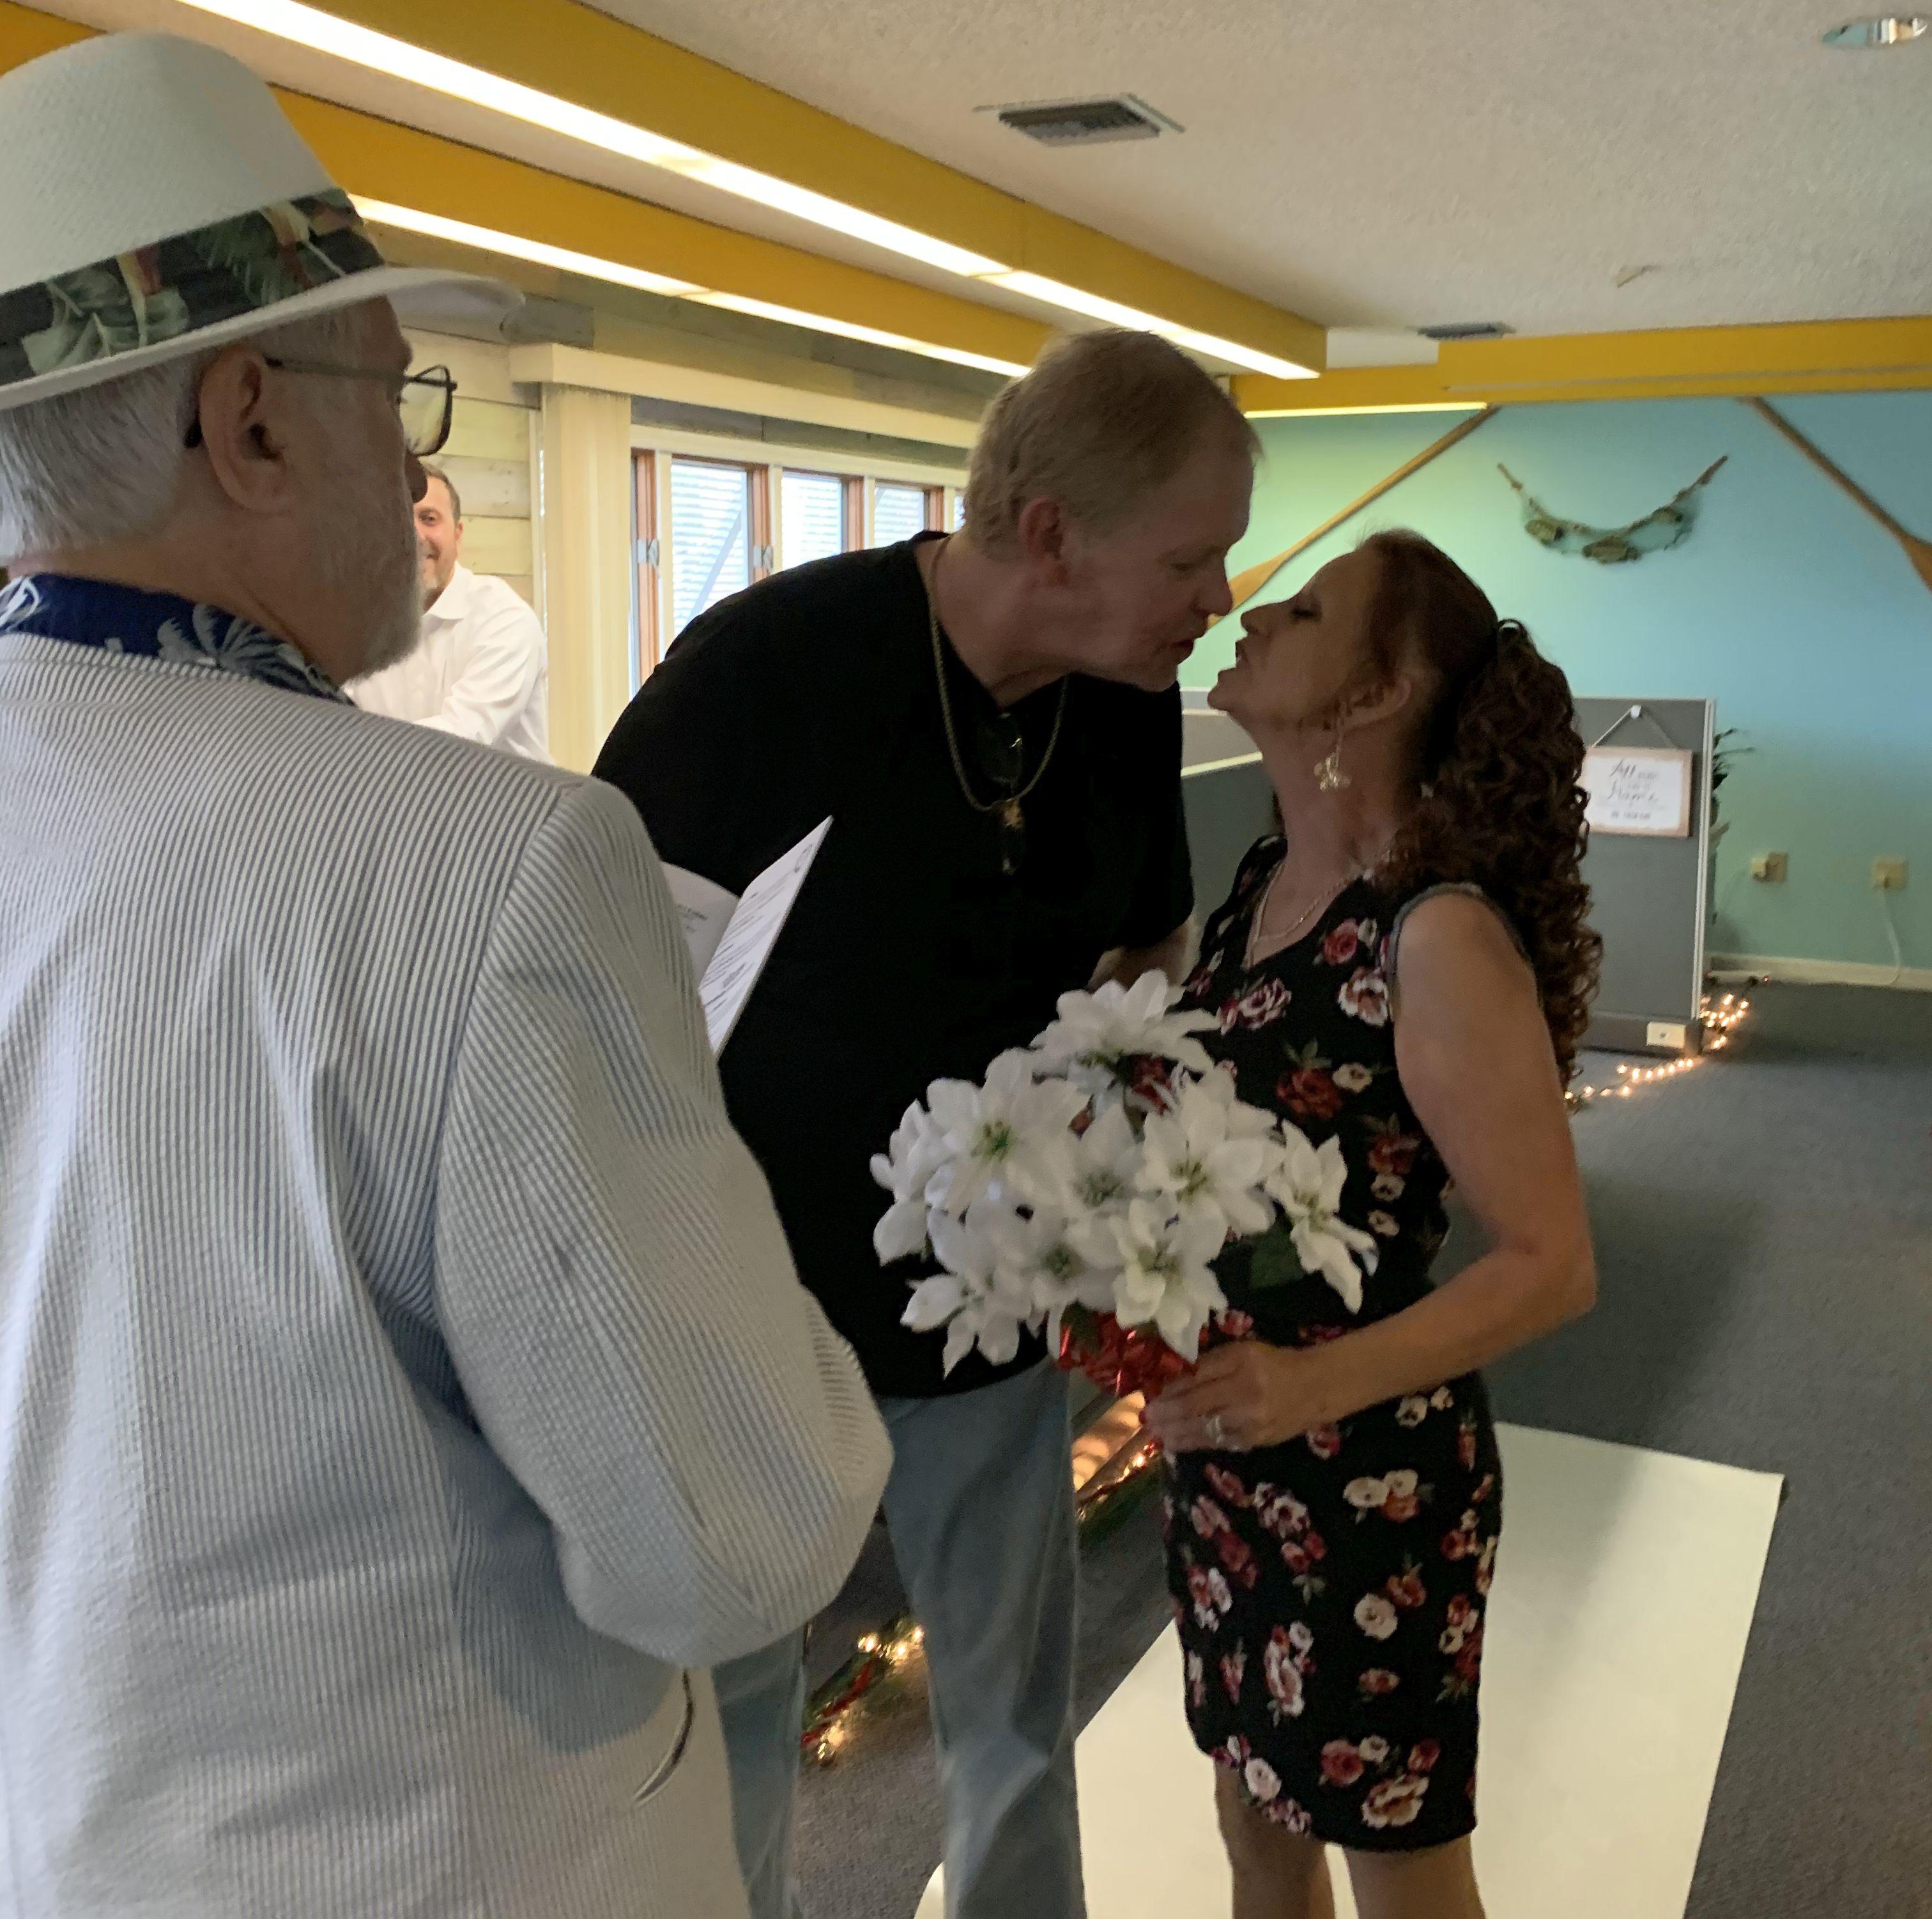 Wedding Day at Mr Palm Bay Realty